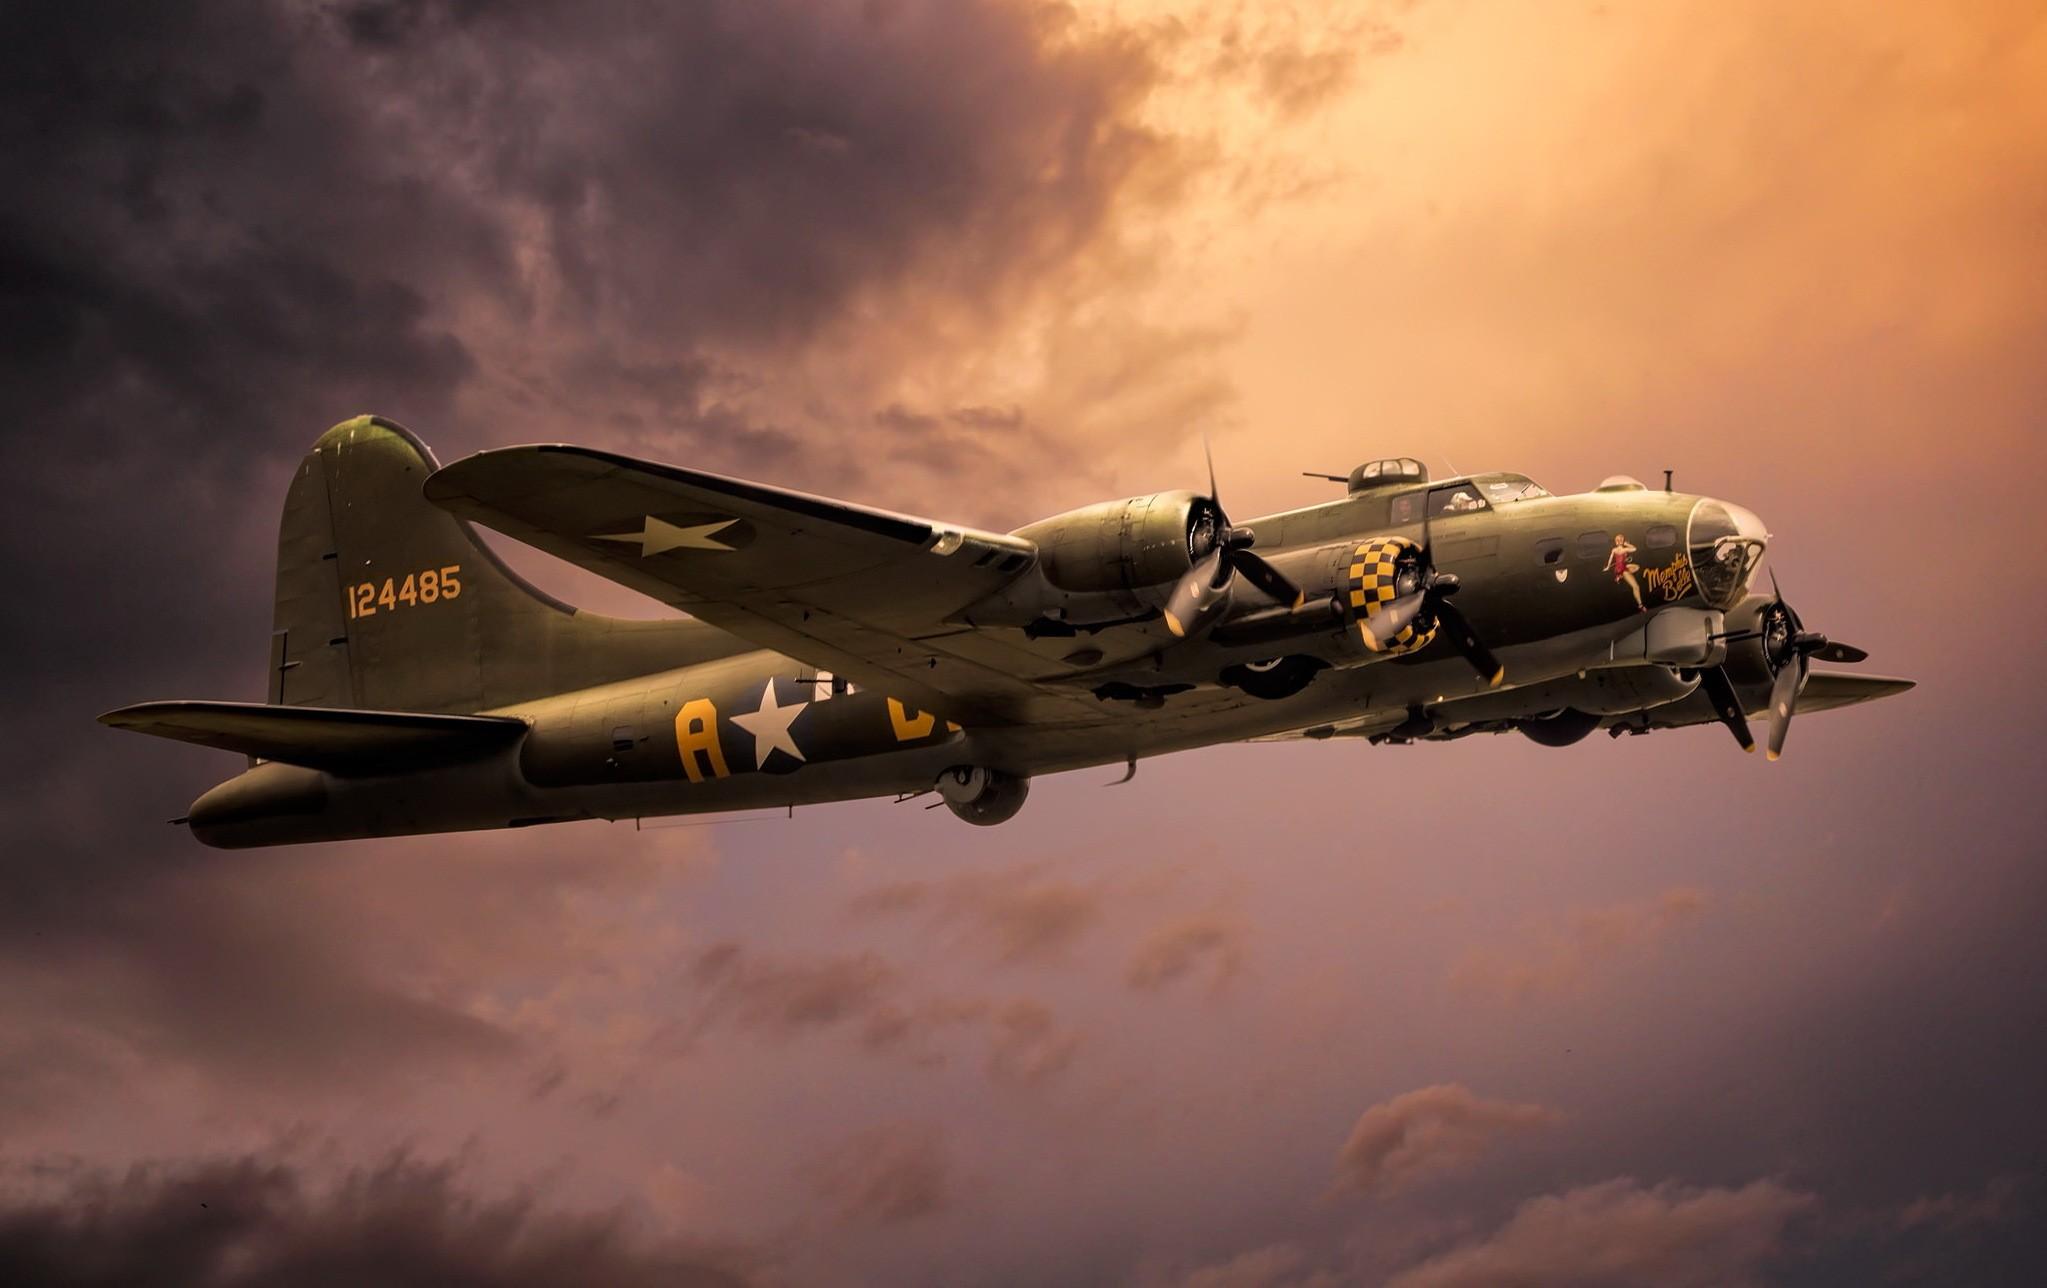 Обои Самолёт, B 17. Авиация foto 11